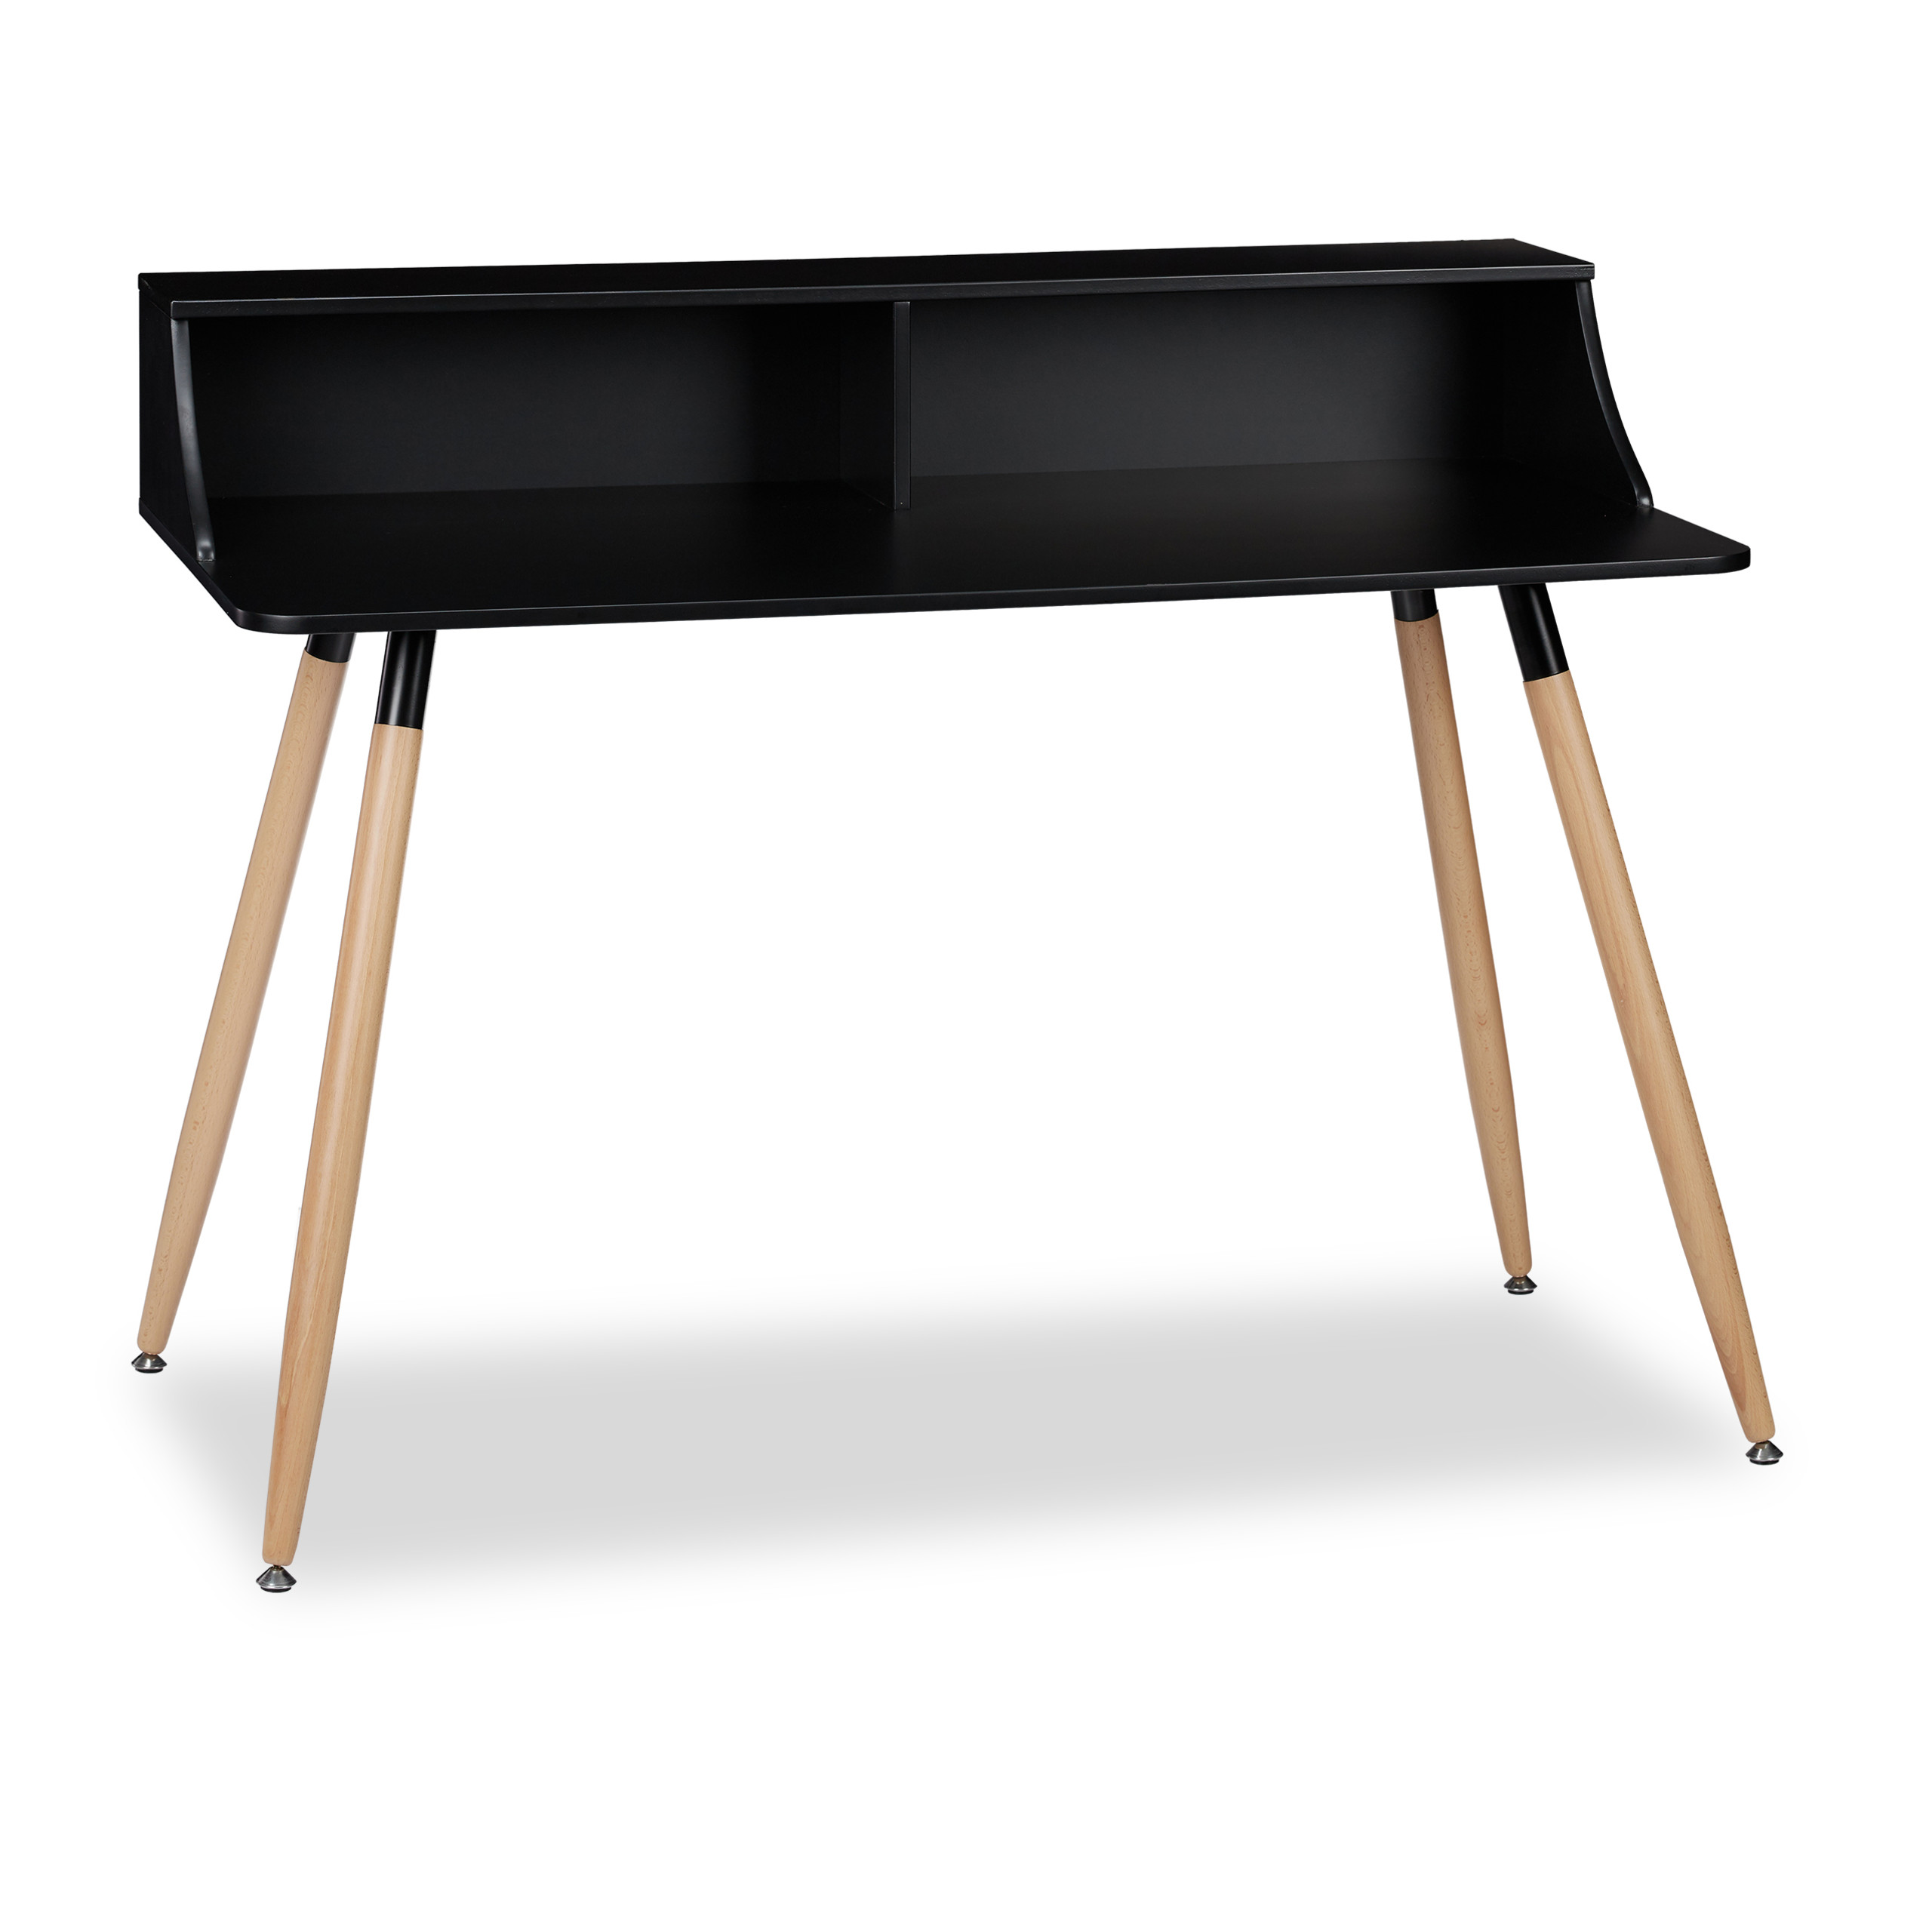 bureau-kinderbureau-ruimtebesparend-75-cm-hoog-laptoptafel-120-breed miniatuur 15